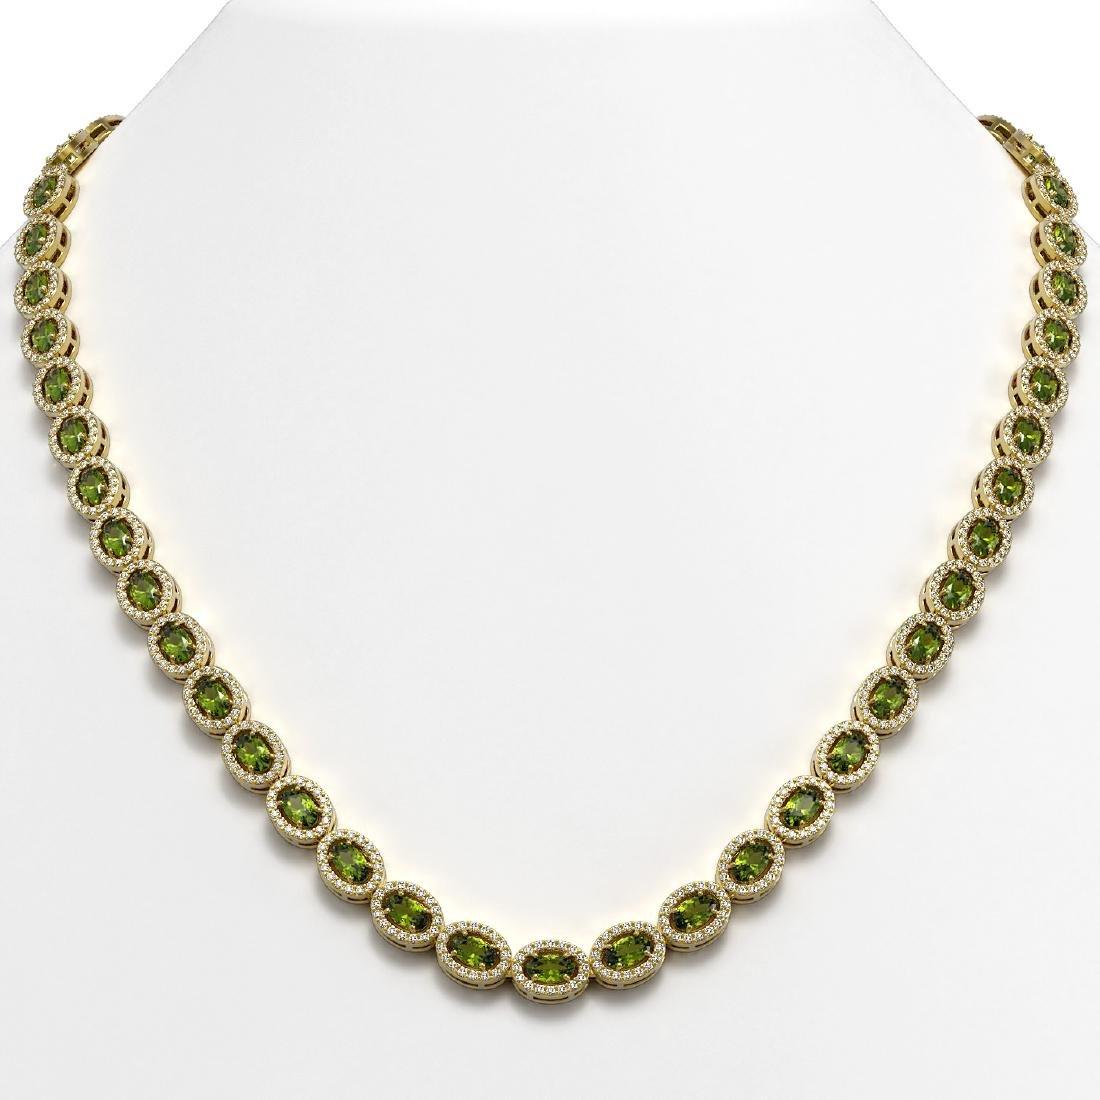 23.57 CTW Tourmaline & Diamond Halo Necklace 10K Yellow